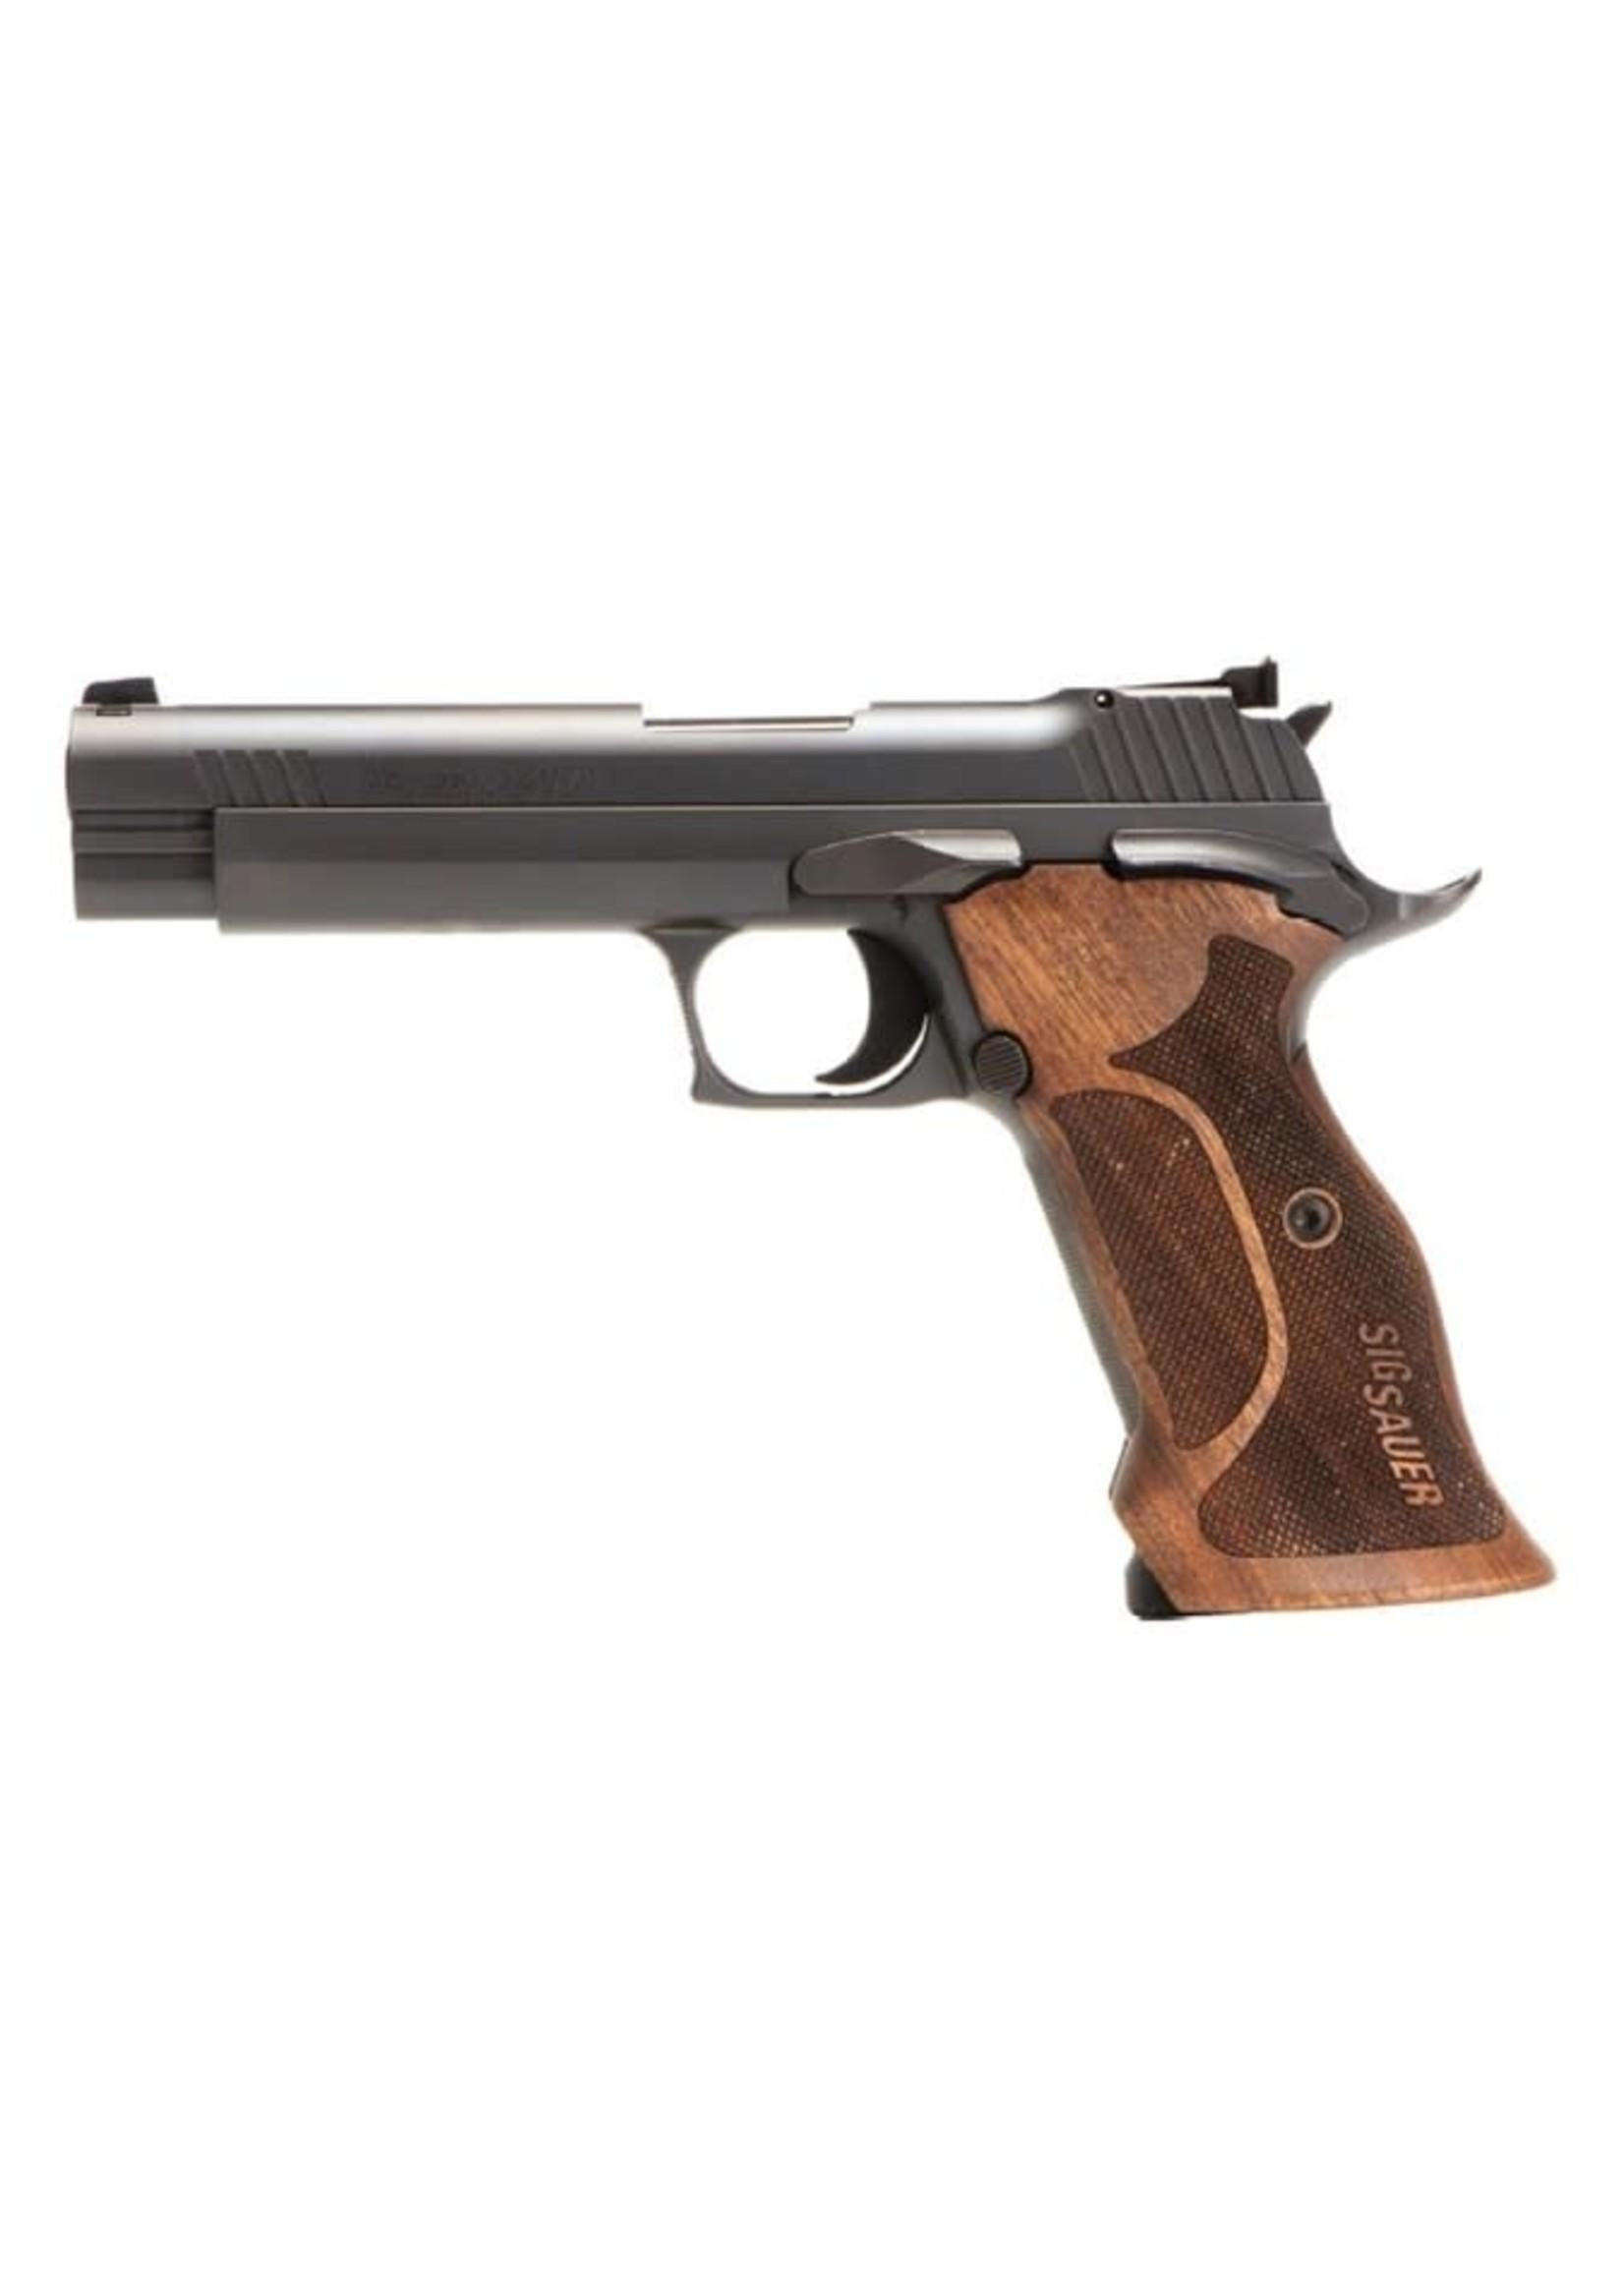 "Sig Sauer Sig Sauer P210 Target Pistol 9mm, Walnut Handle, 5"", 8+1"